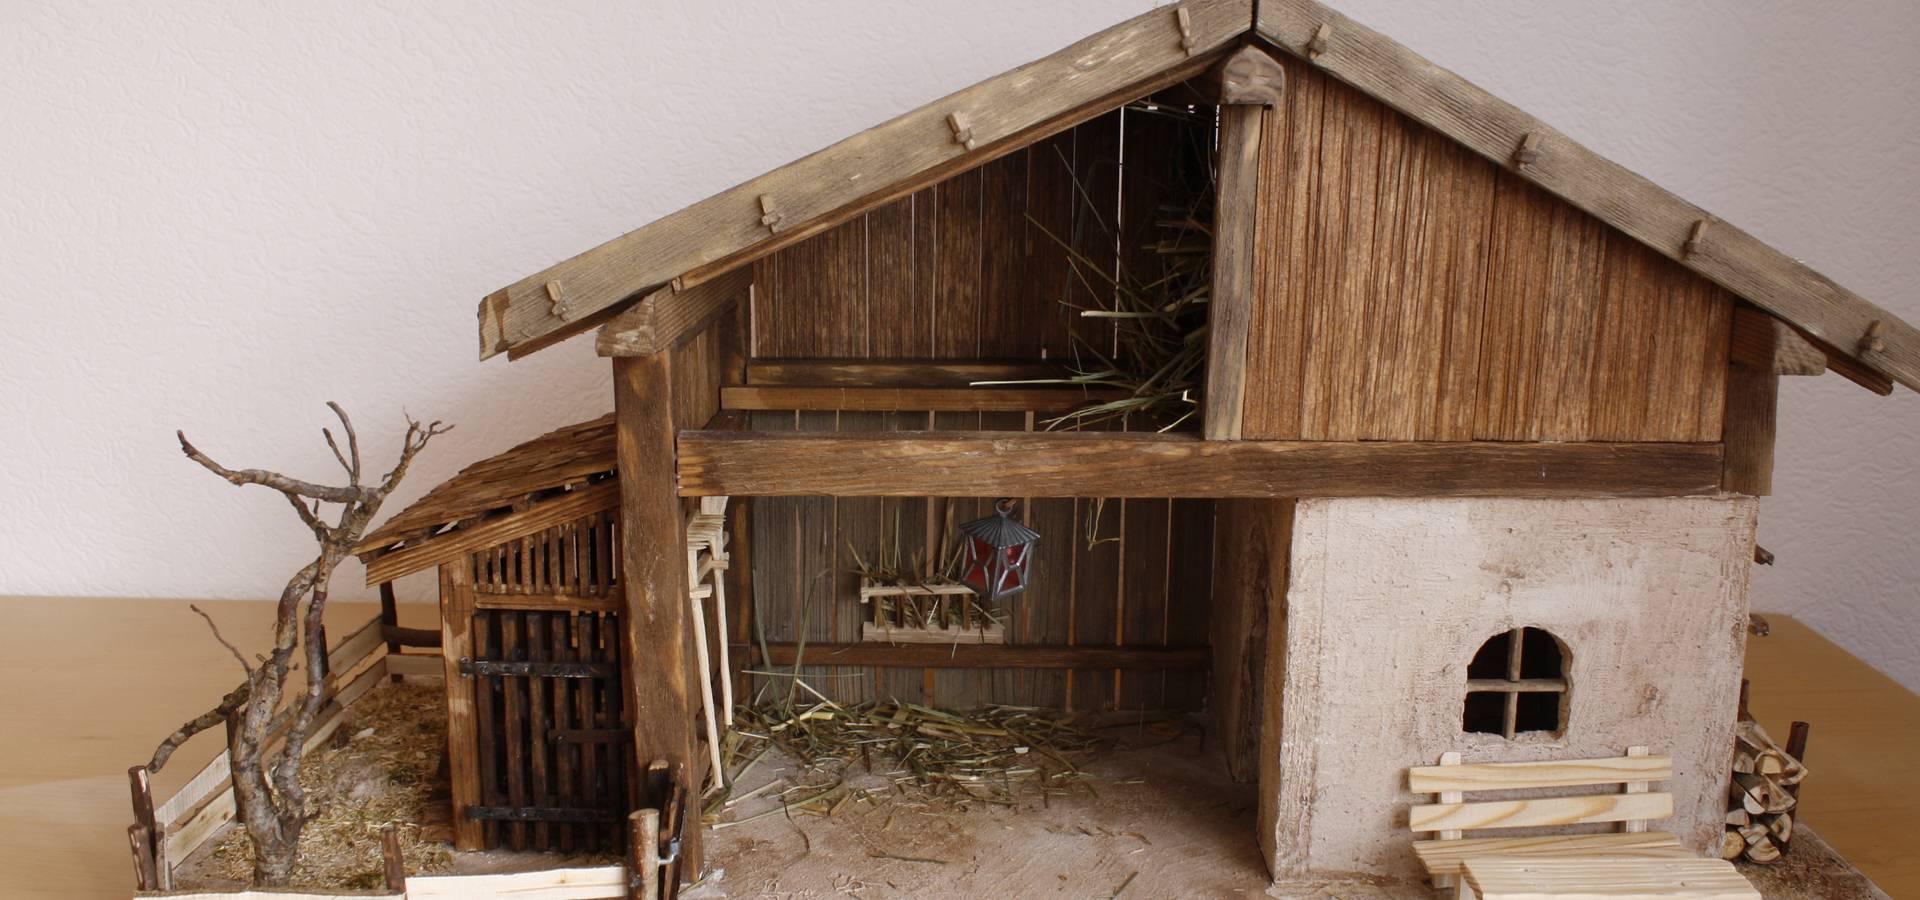 paul paulinchen m bel accessoires in schwabach homify. Black Bedroom Furniture Sets. Home Design Ideas